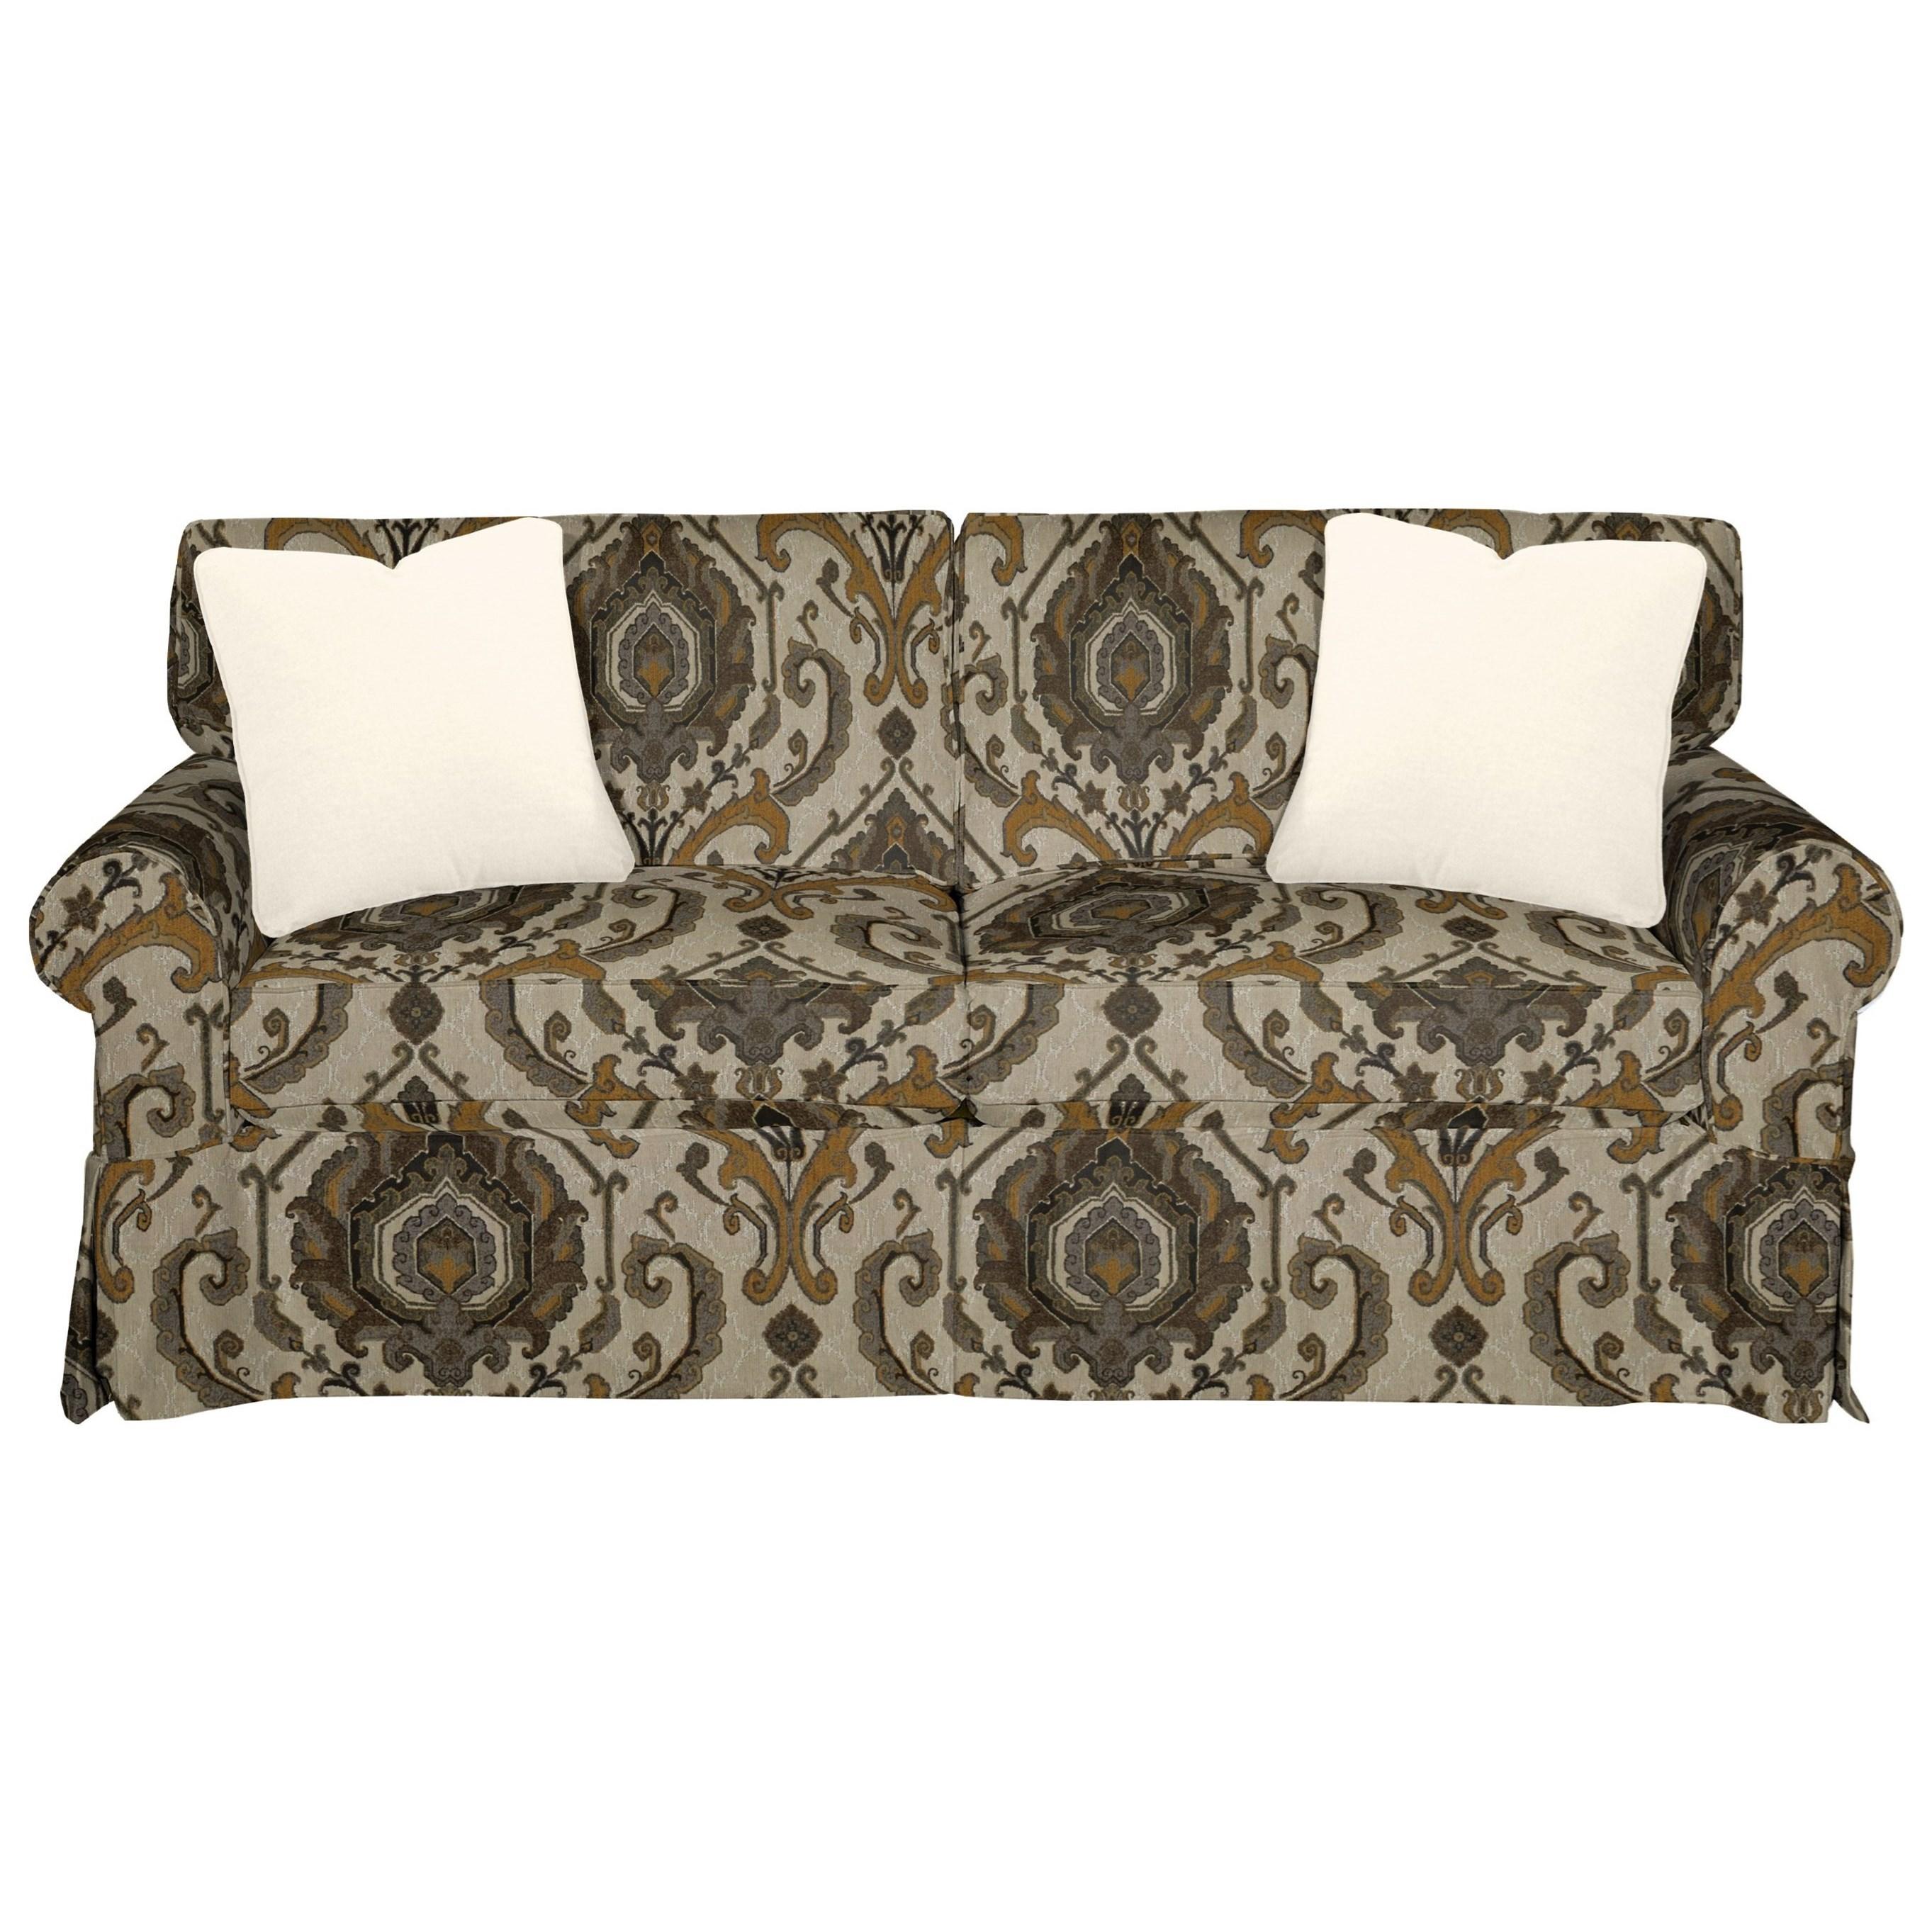 9228 Sleeper Sofa w/ Innerspring Mattress by Craftmaster at VanDrie Home Furnishings